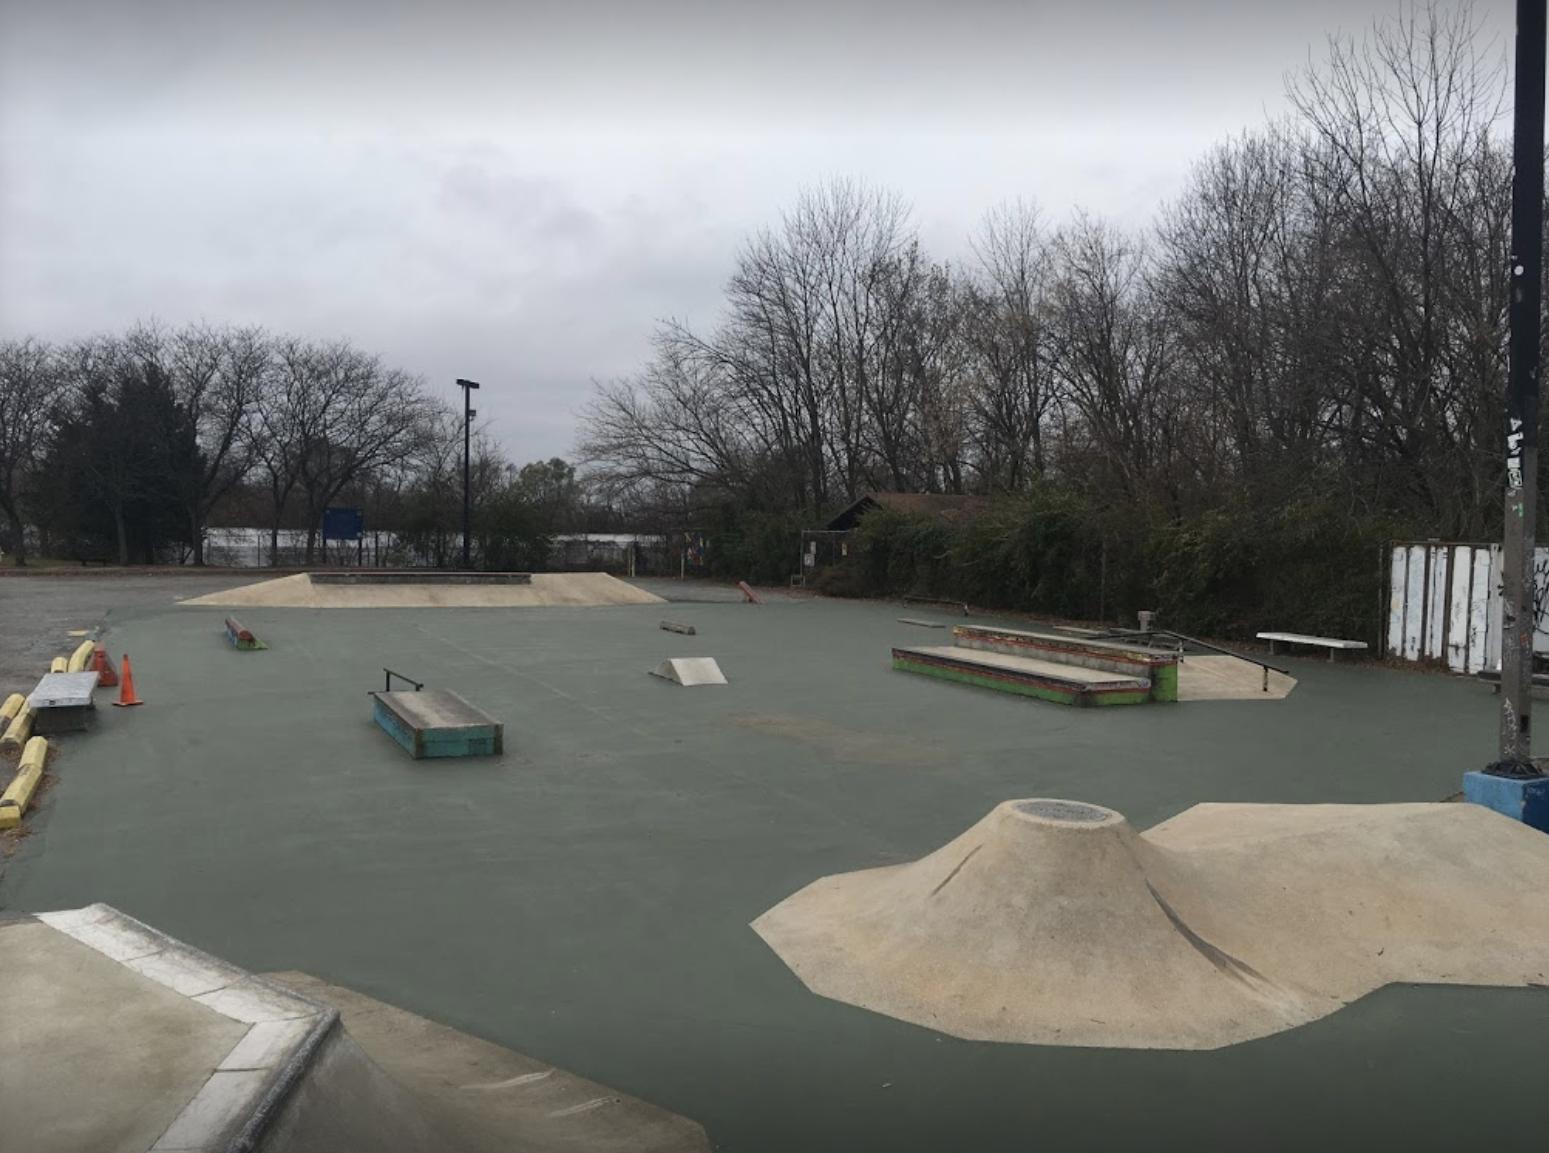 7th st. skatepark - Wilmington, Delaware